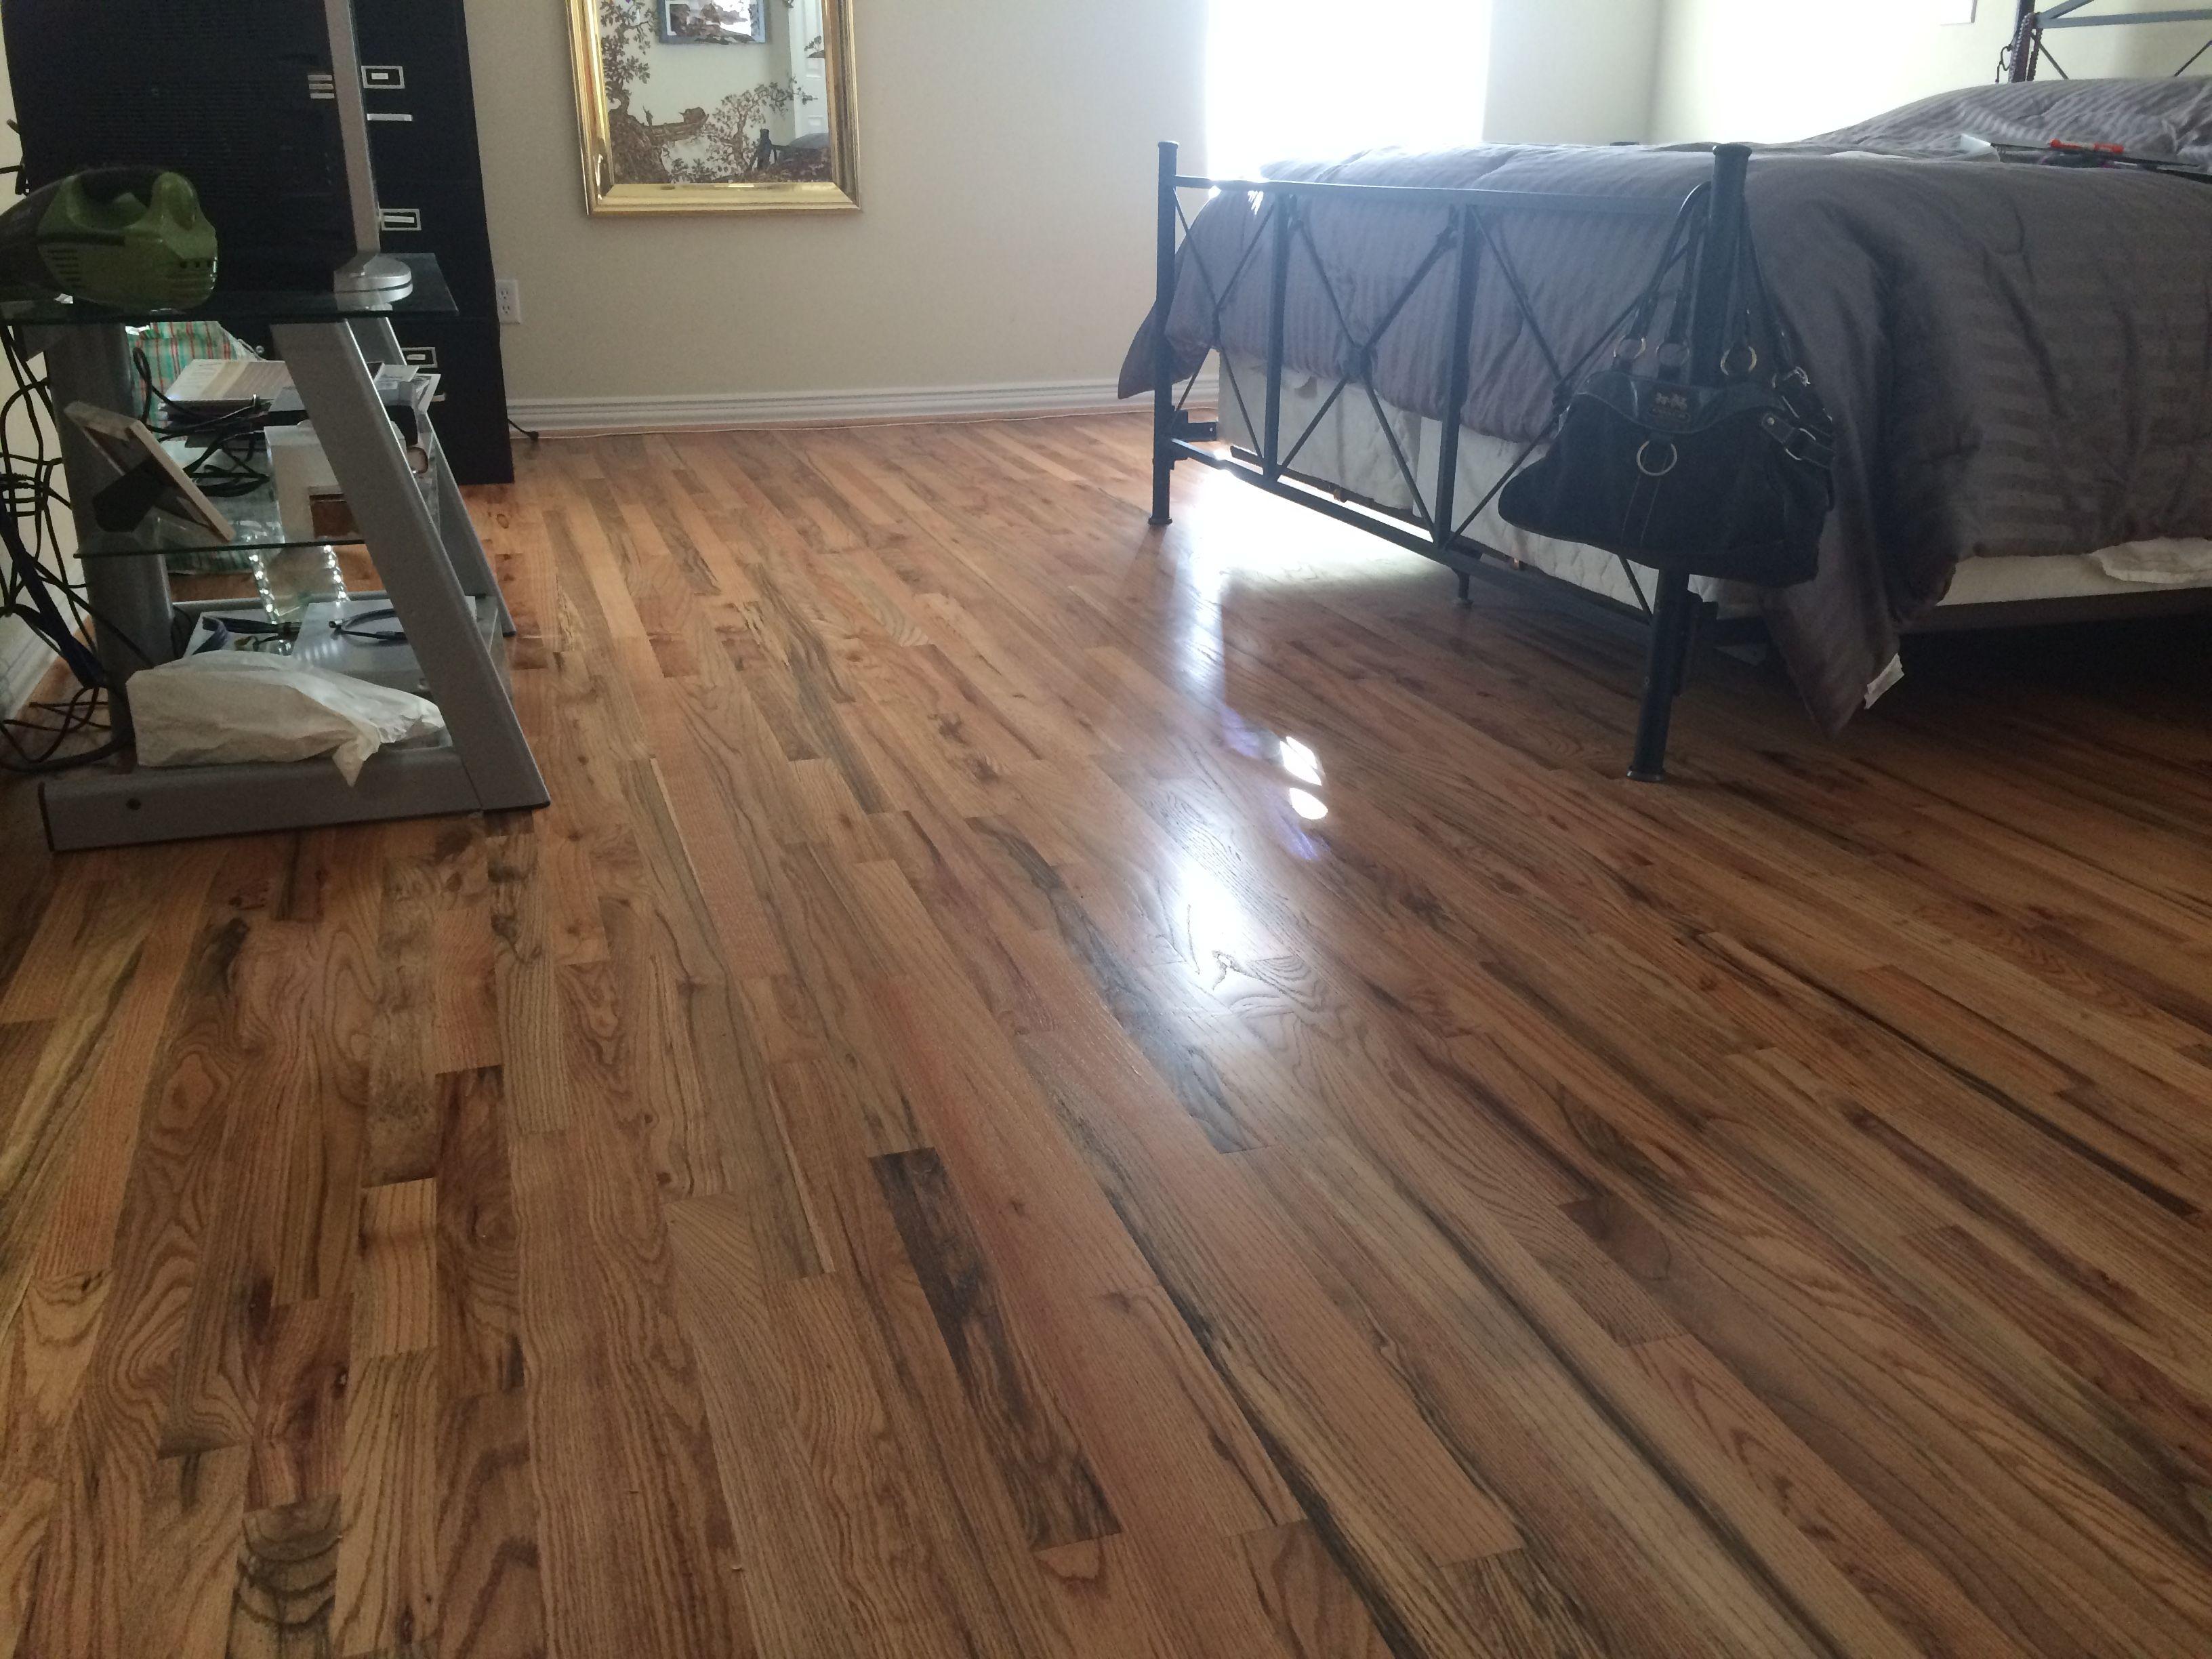 Refinishing Hardwood Floor Houston Part - 15: Hardwood Floor Refinishing